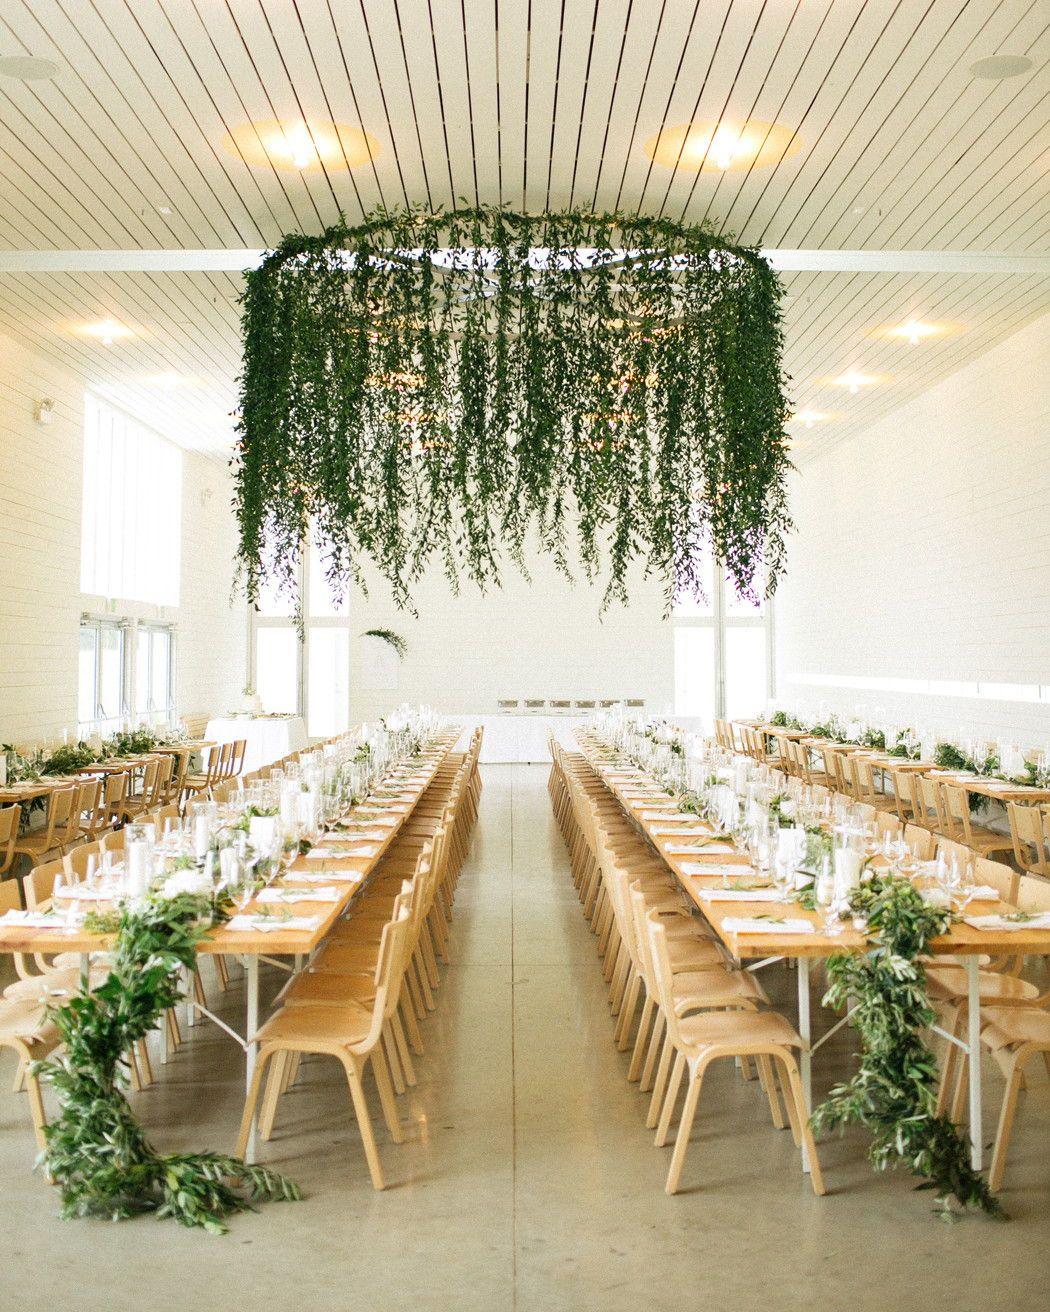 Cheap Wedding Reception Venue Ideas: Hanging Décor Ideas Guaranteed To Elevate Your Wedding